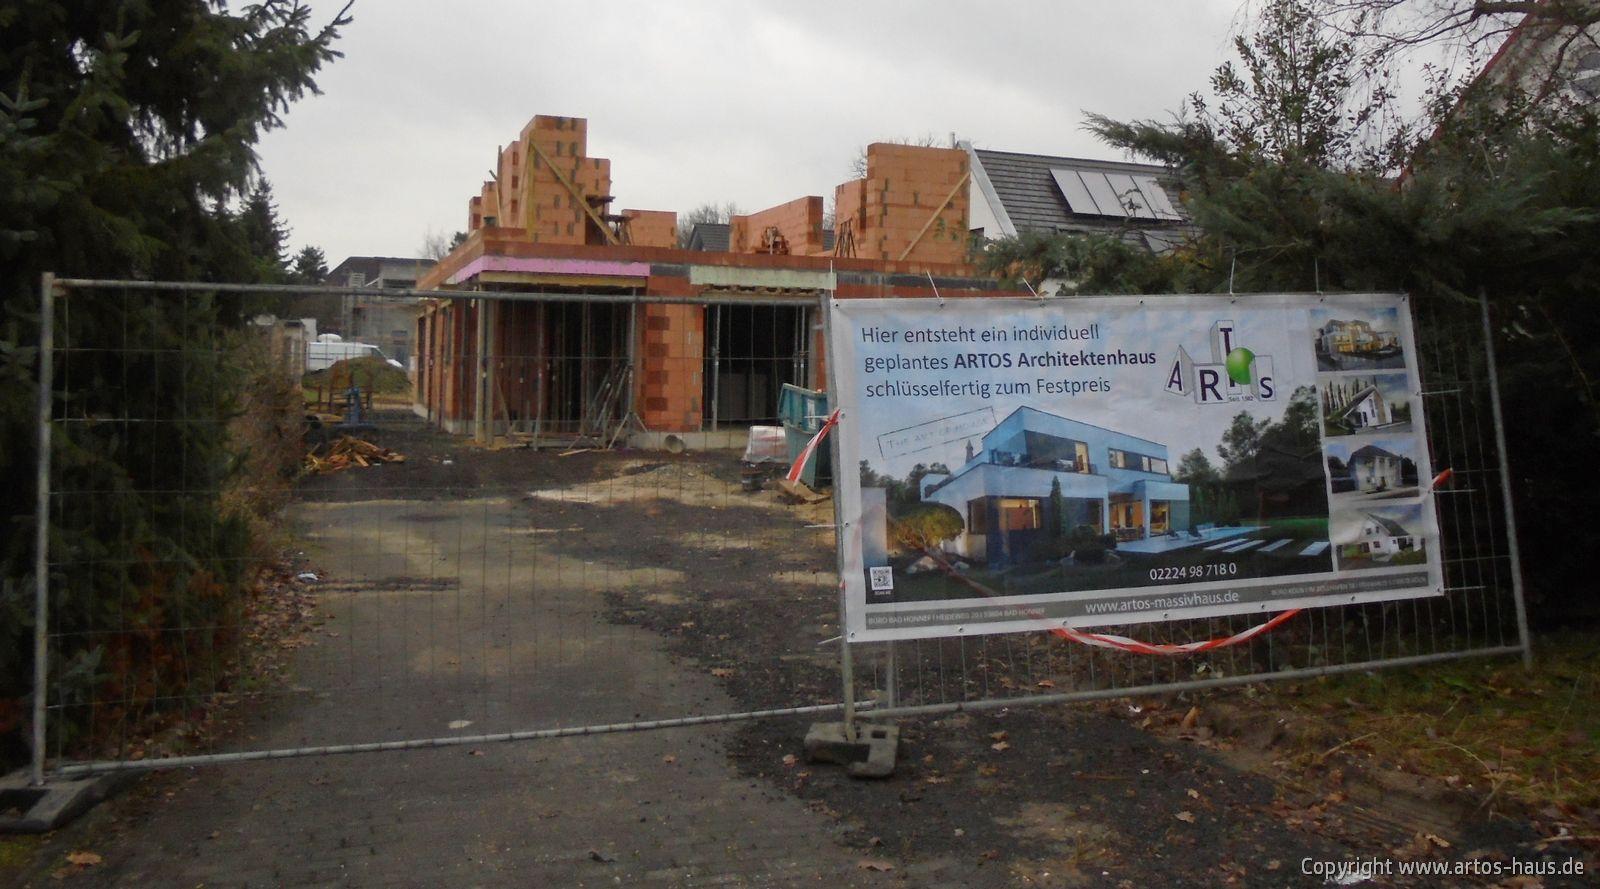 Januar 2021: Blick auf die ARTOS HAUS Baustelle in Bonn